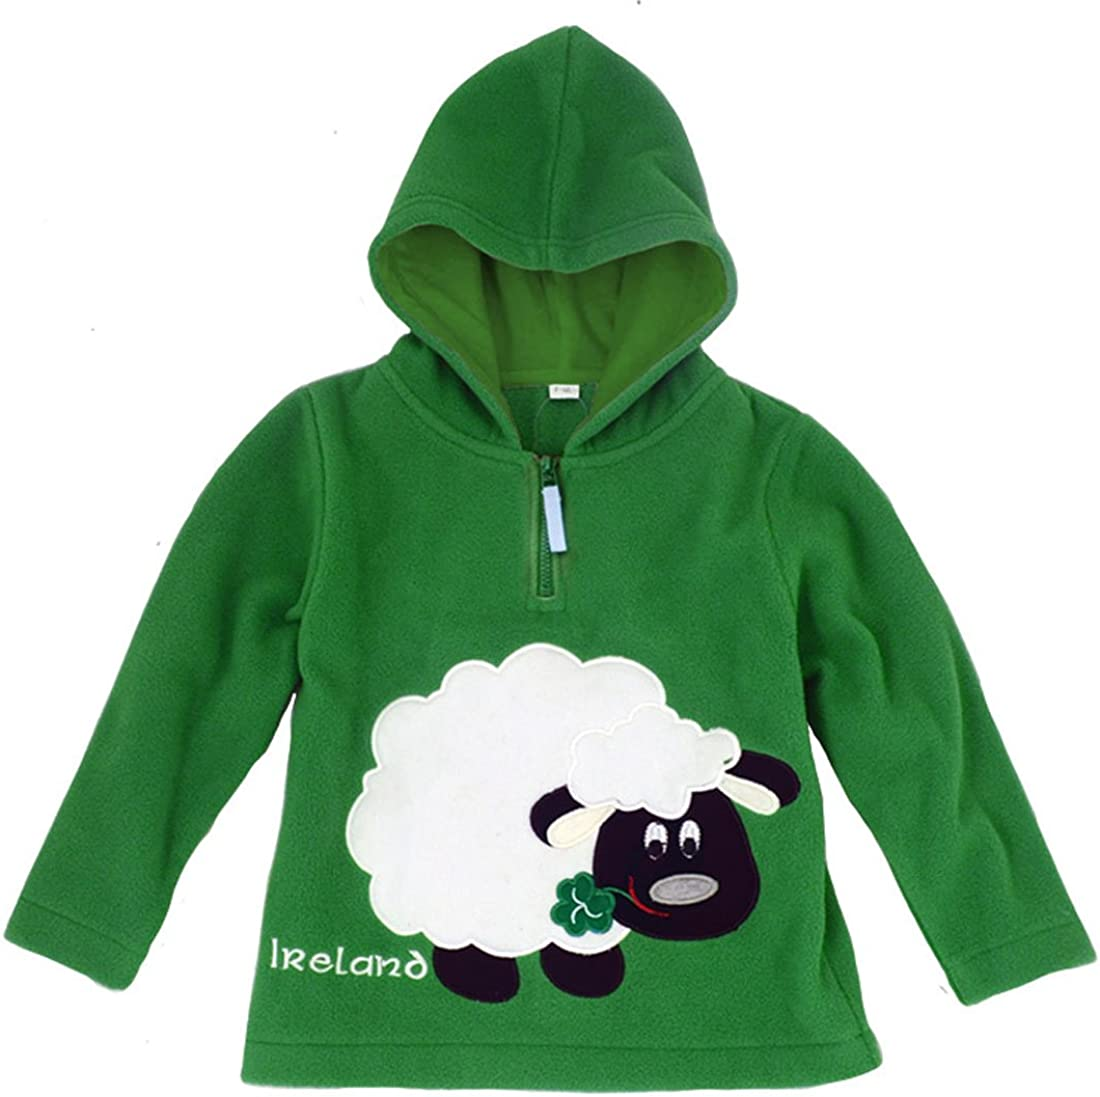 Green Traditional Ireland Sheep Kids Fleece